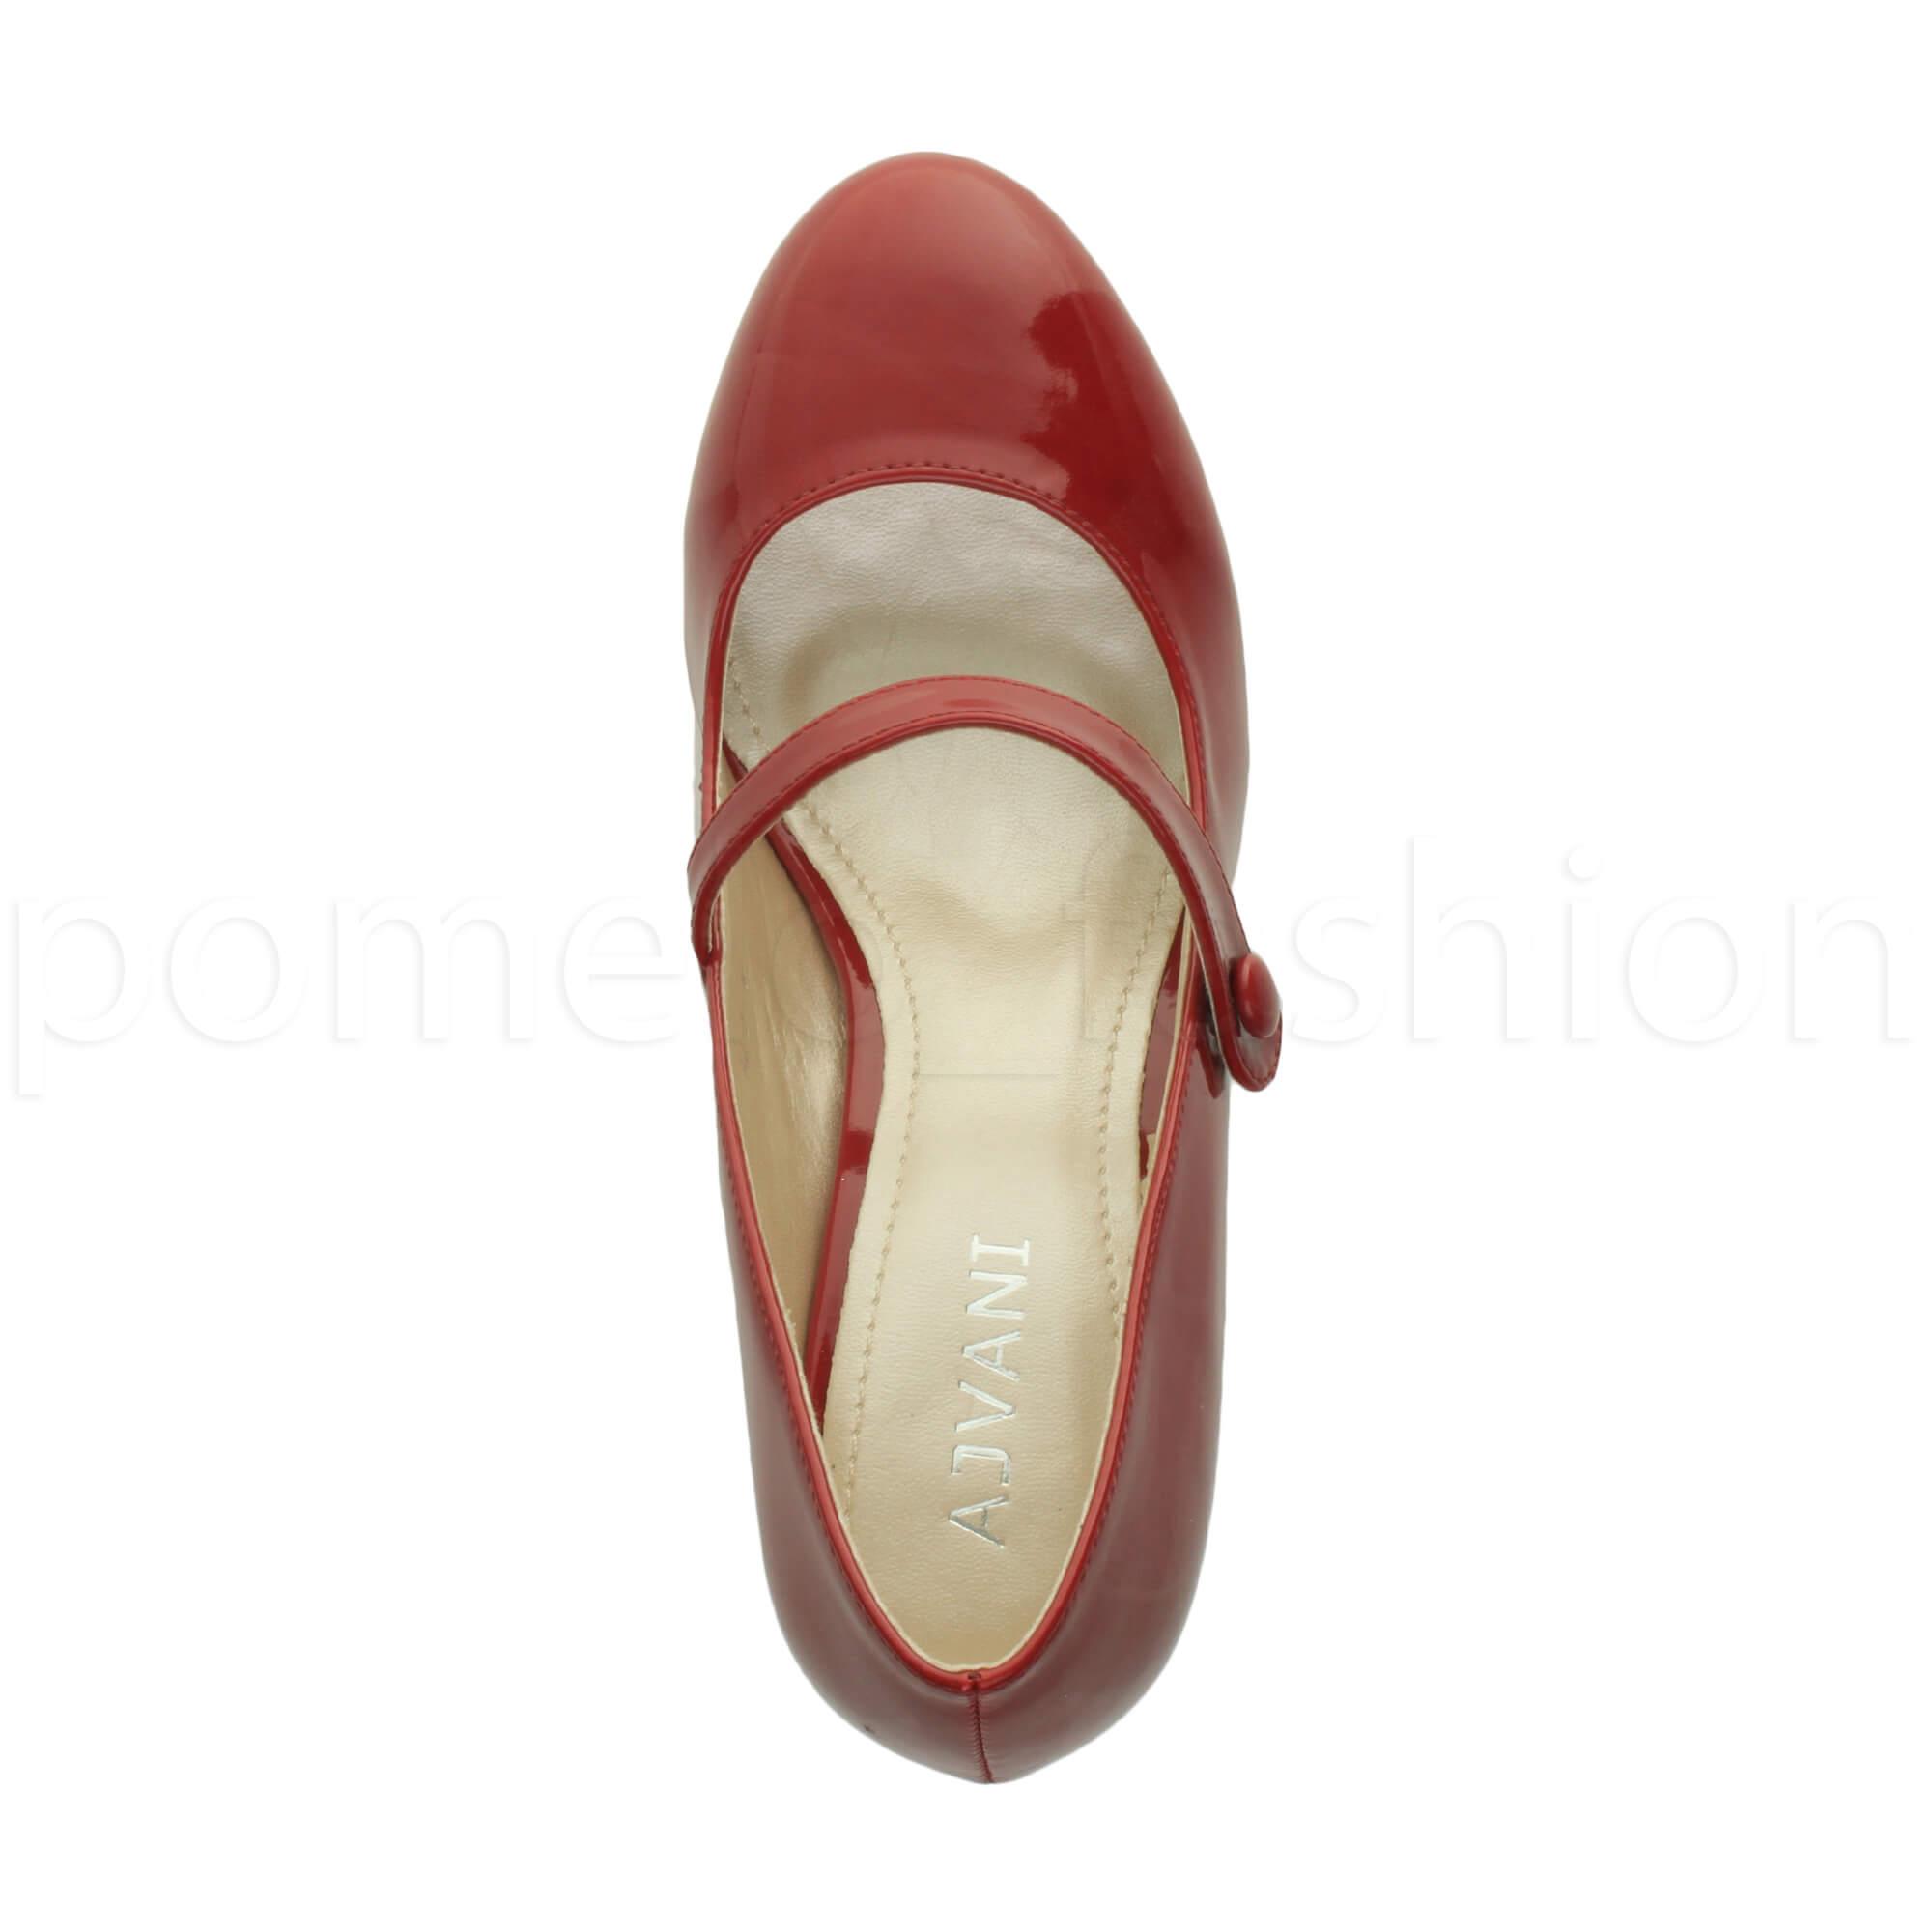 miniatura 49 - Donna basso tacco medio Mary Jane Damigella Matrimonio Pompe Scarpe Da Sera Taglia